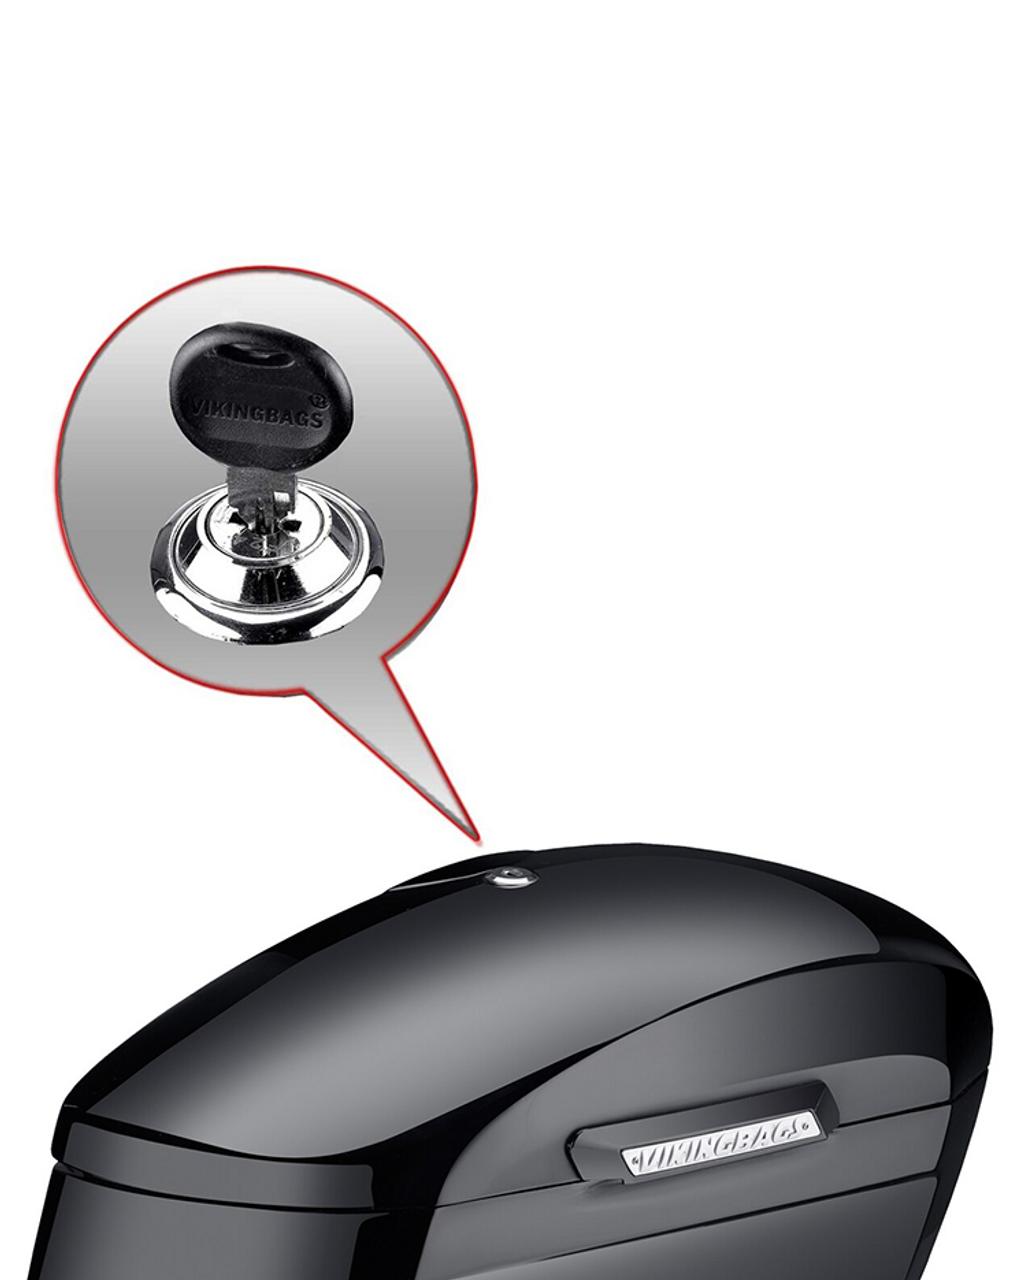 Honda VTX 1800 S Lamellar Extra Large Shock Cutout Saddlebag lock key view